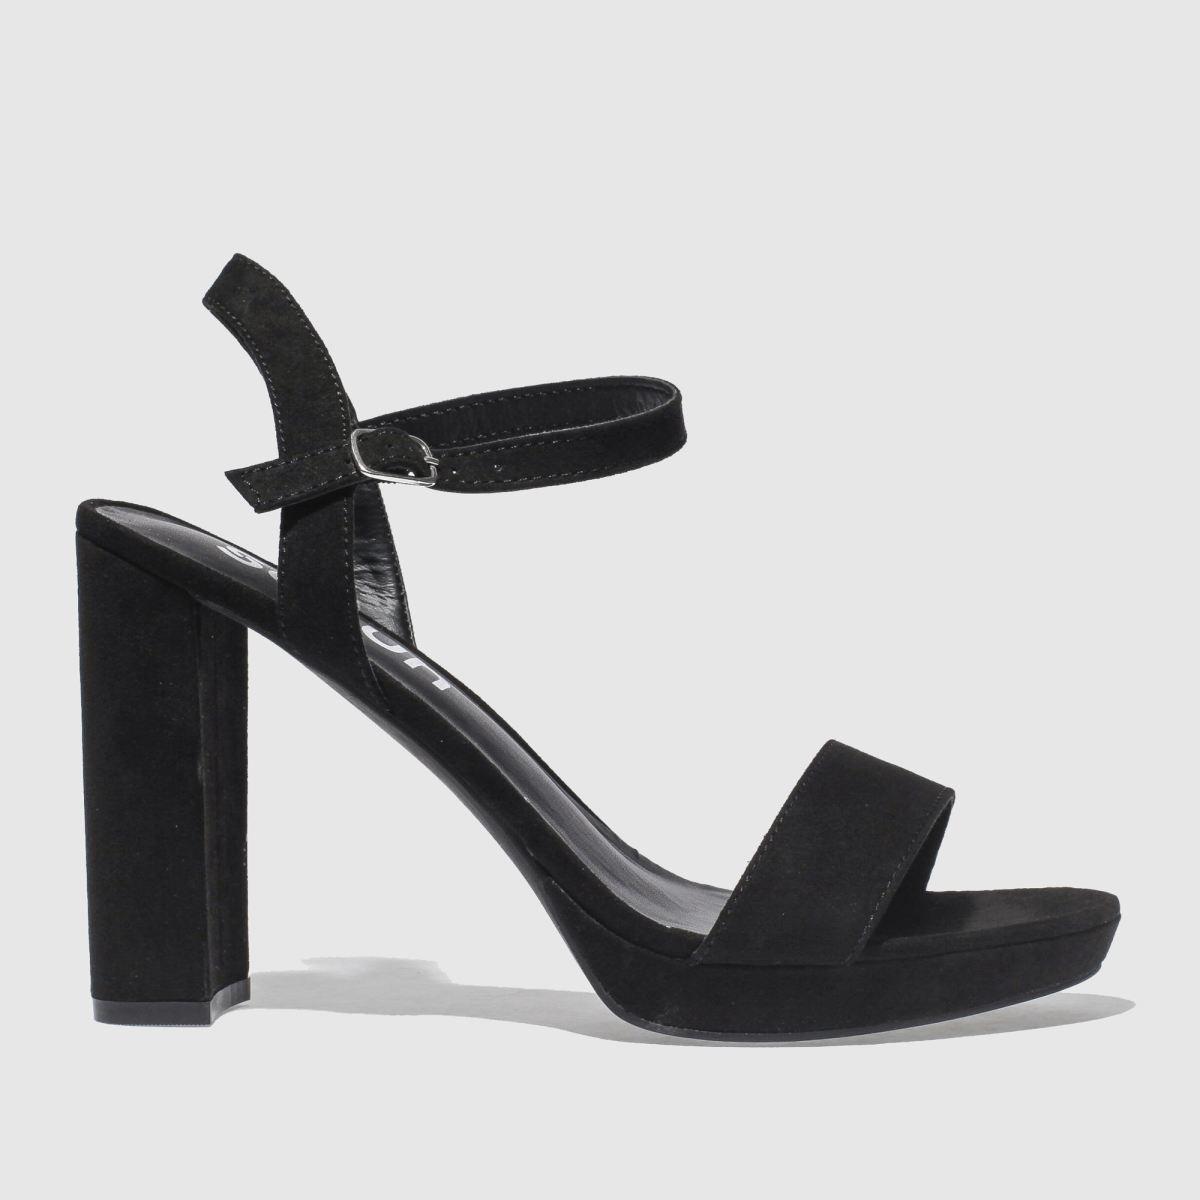 schuh Schuh Black Miraculous High Heels